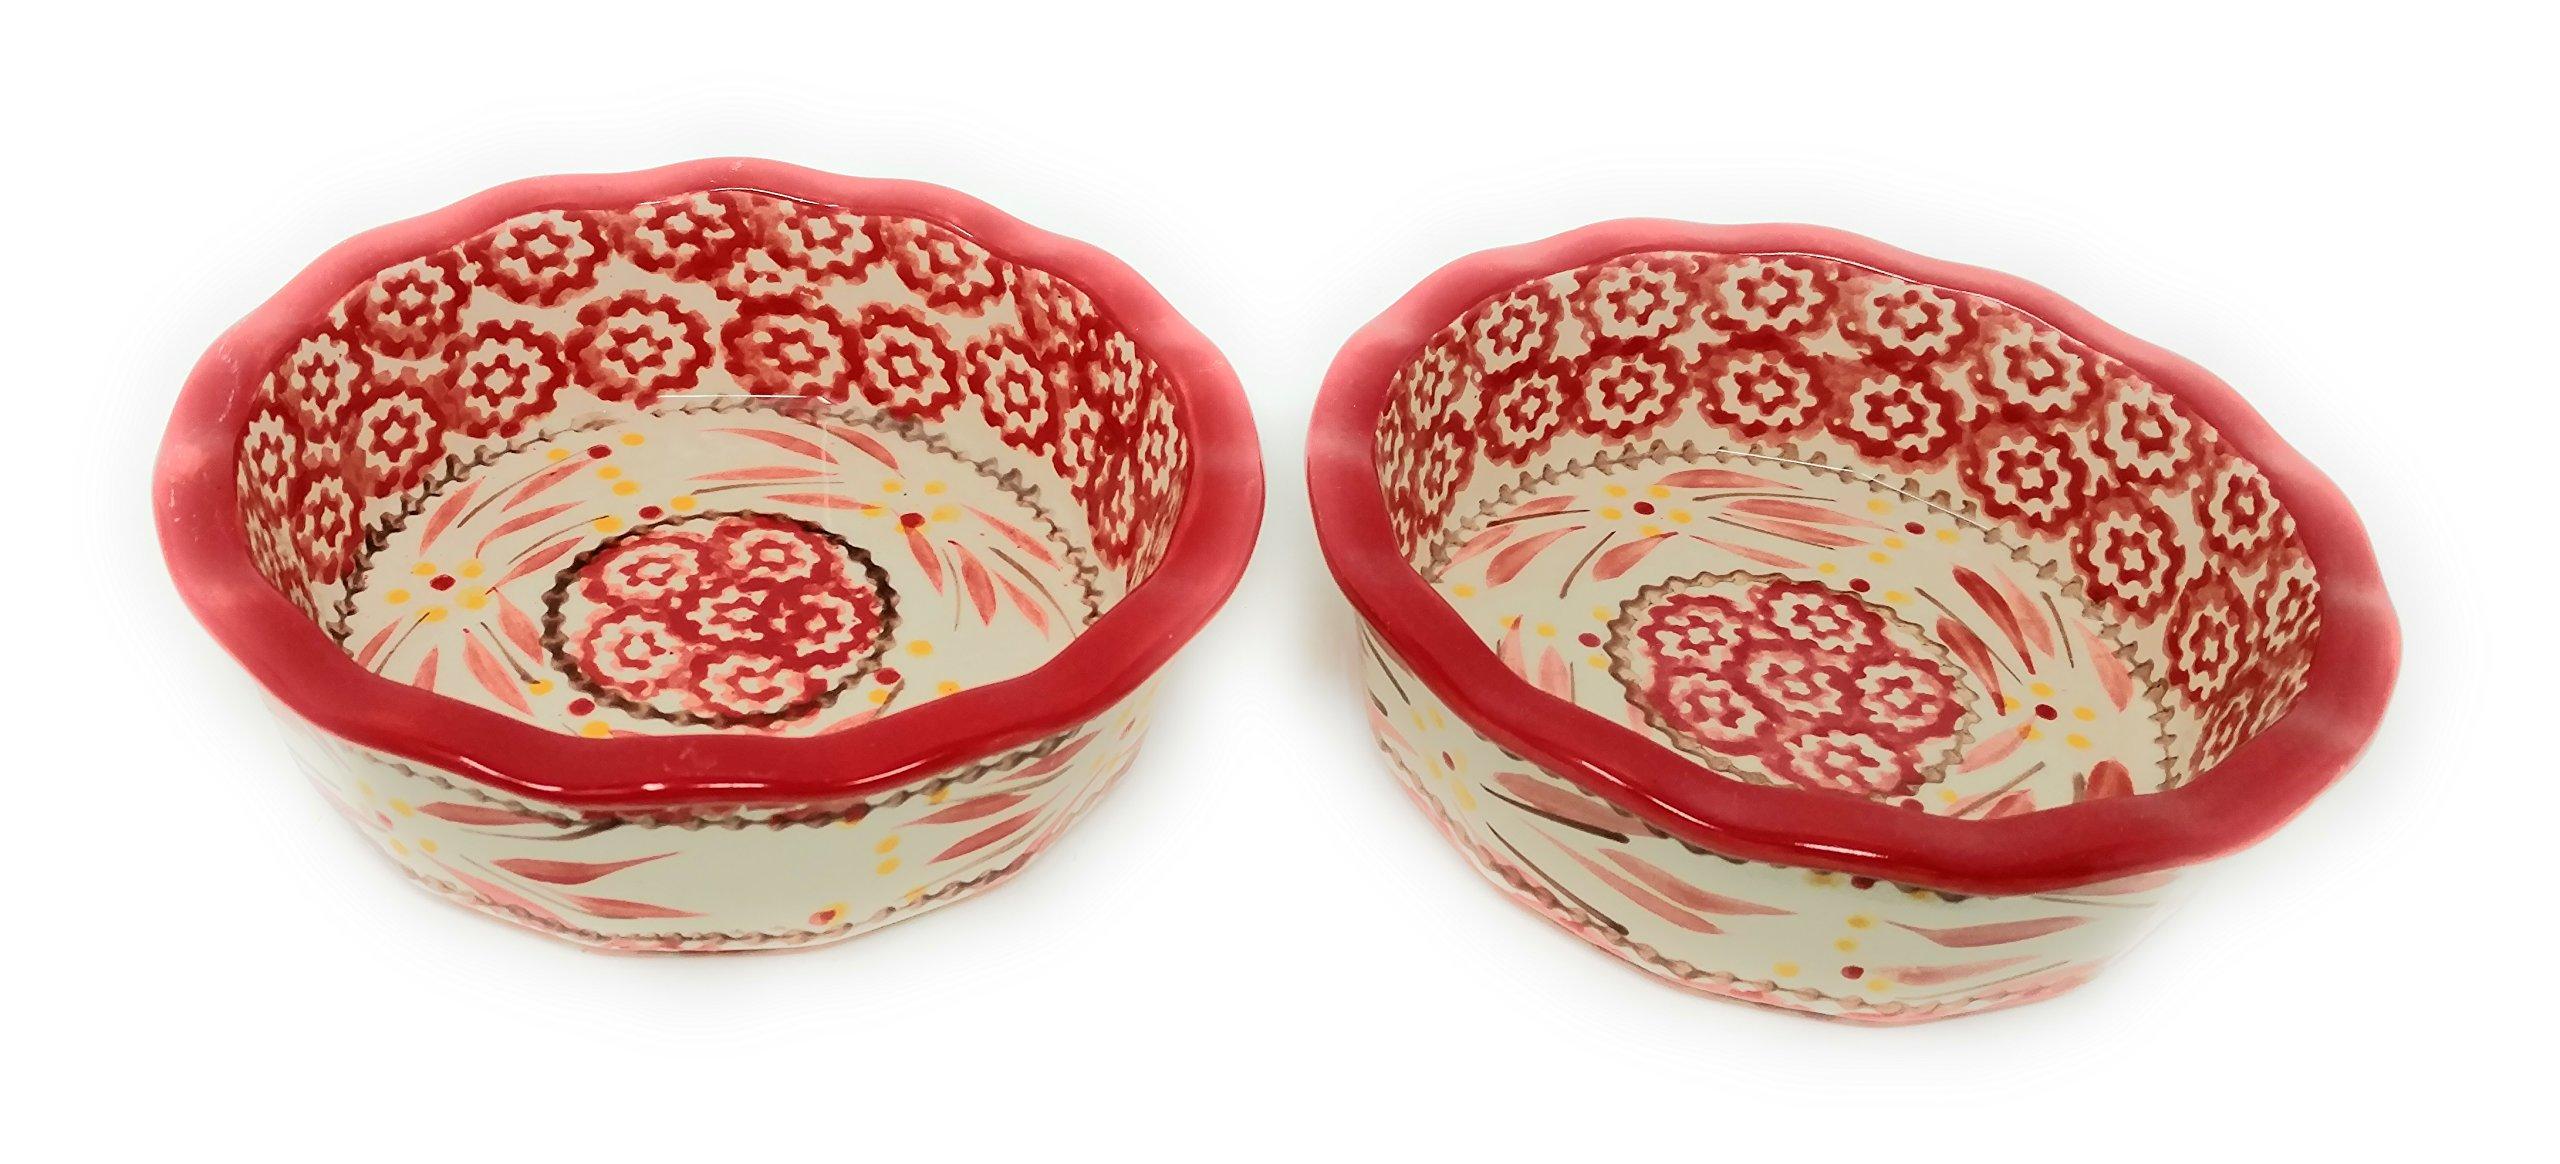 Temp-tations Set of 2 Mini Pie Pans, Deep Dish 5.75'' x 1.75'' each - Stoneware (Old World Red)